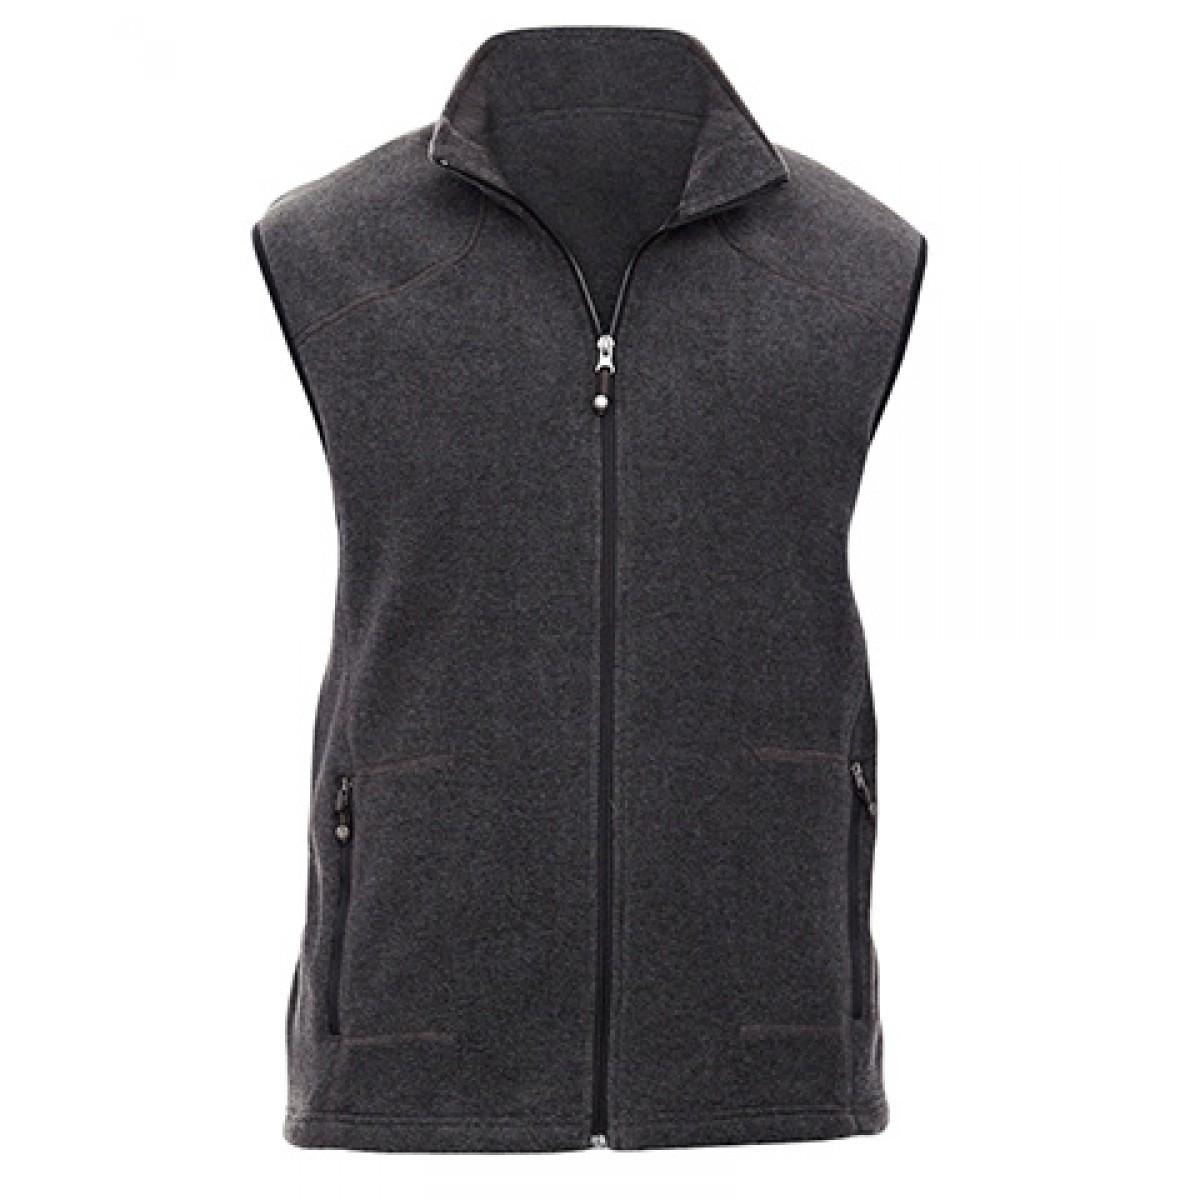 Men's Voyage Fleece Vest-Gray -2XL